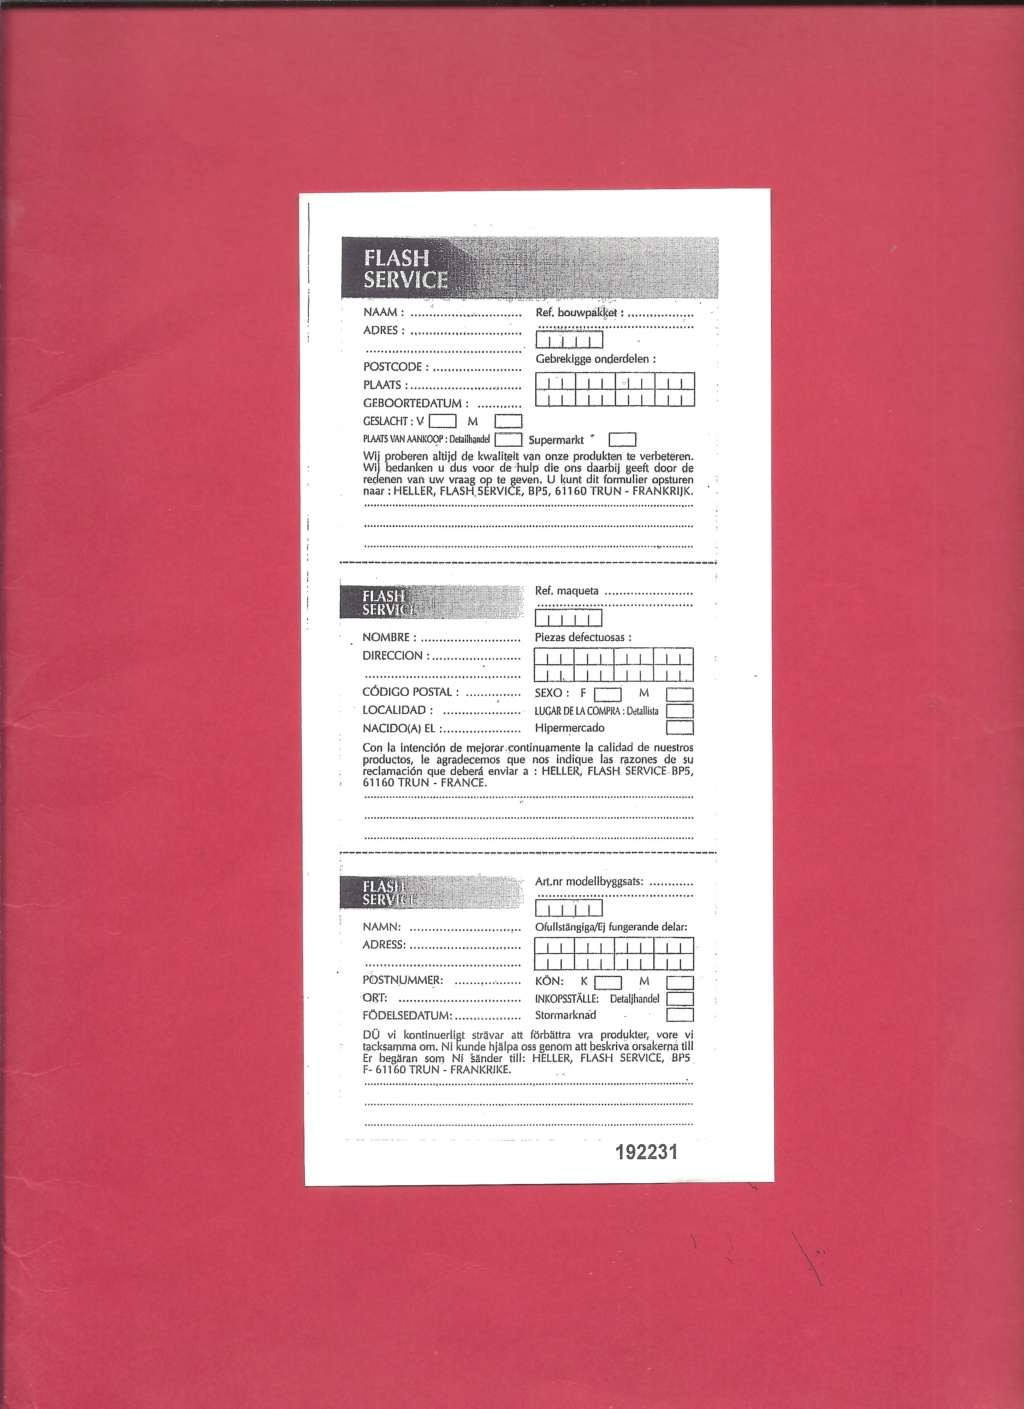 RENAULT VAB 4X4 1/72ème Ref 79898 Notice Helle387